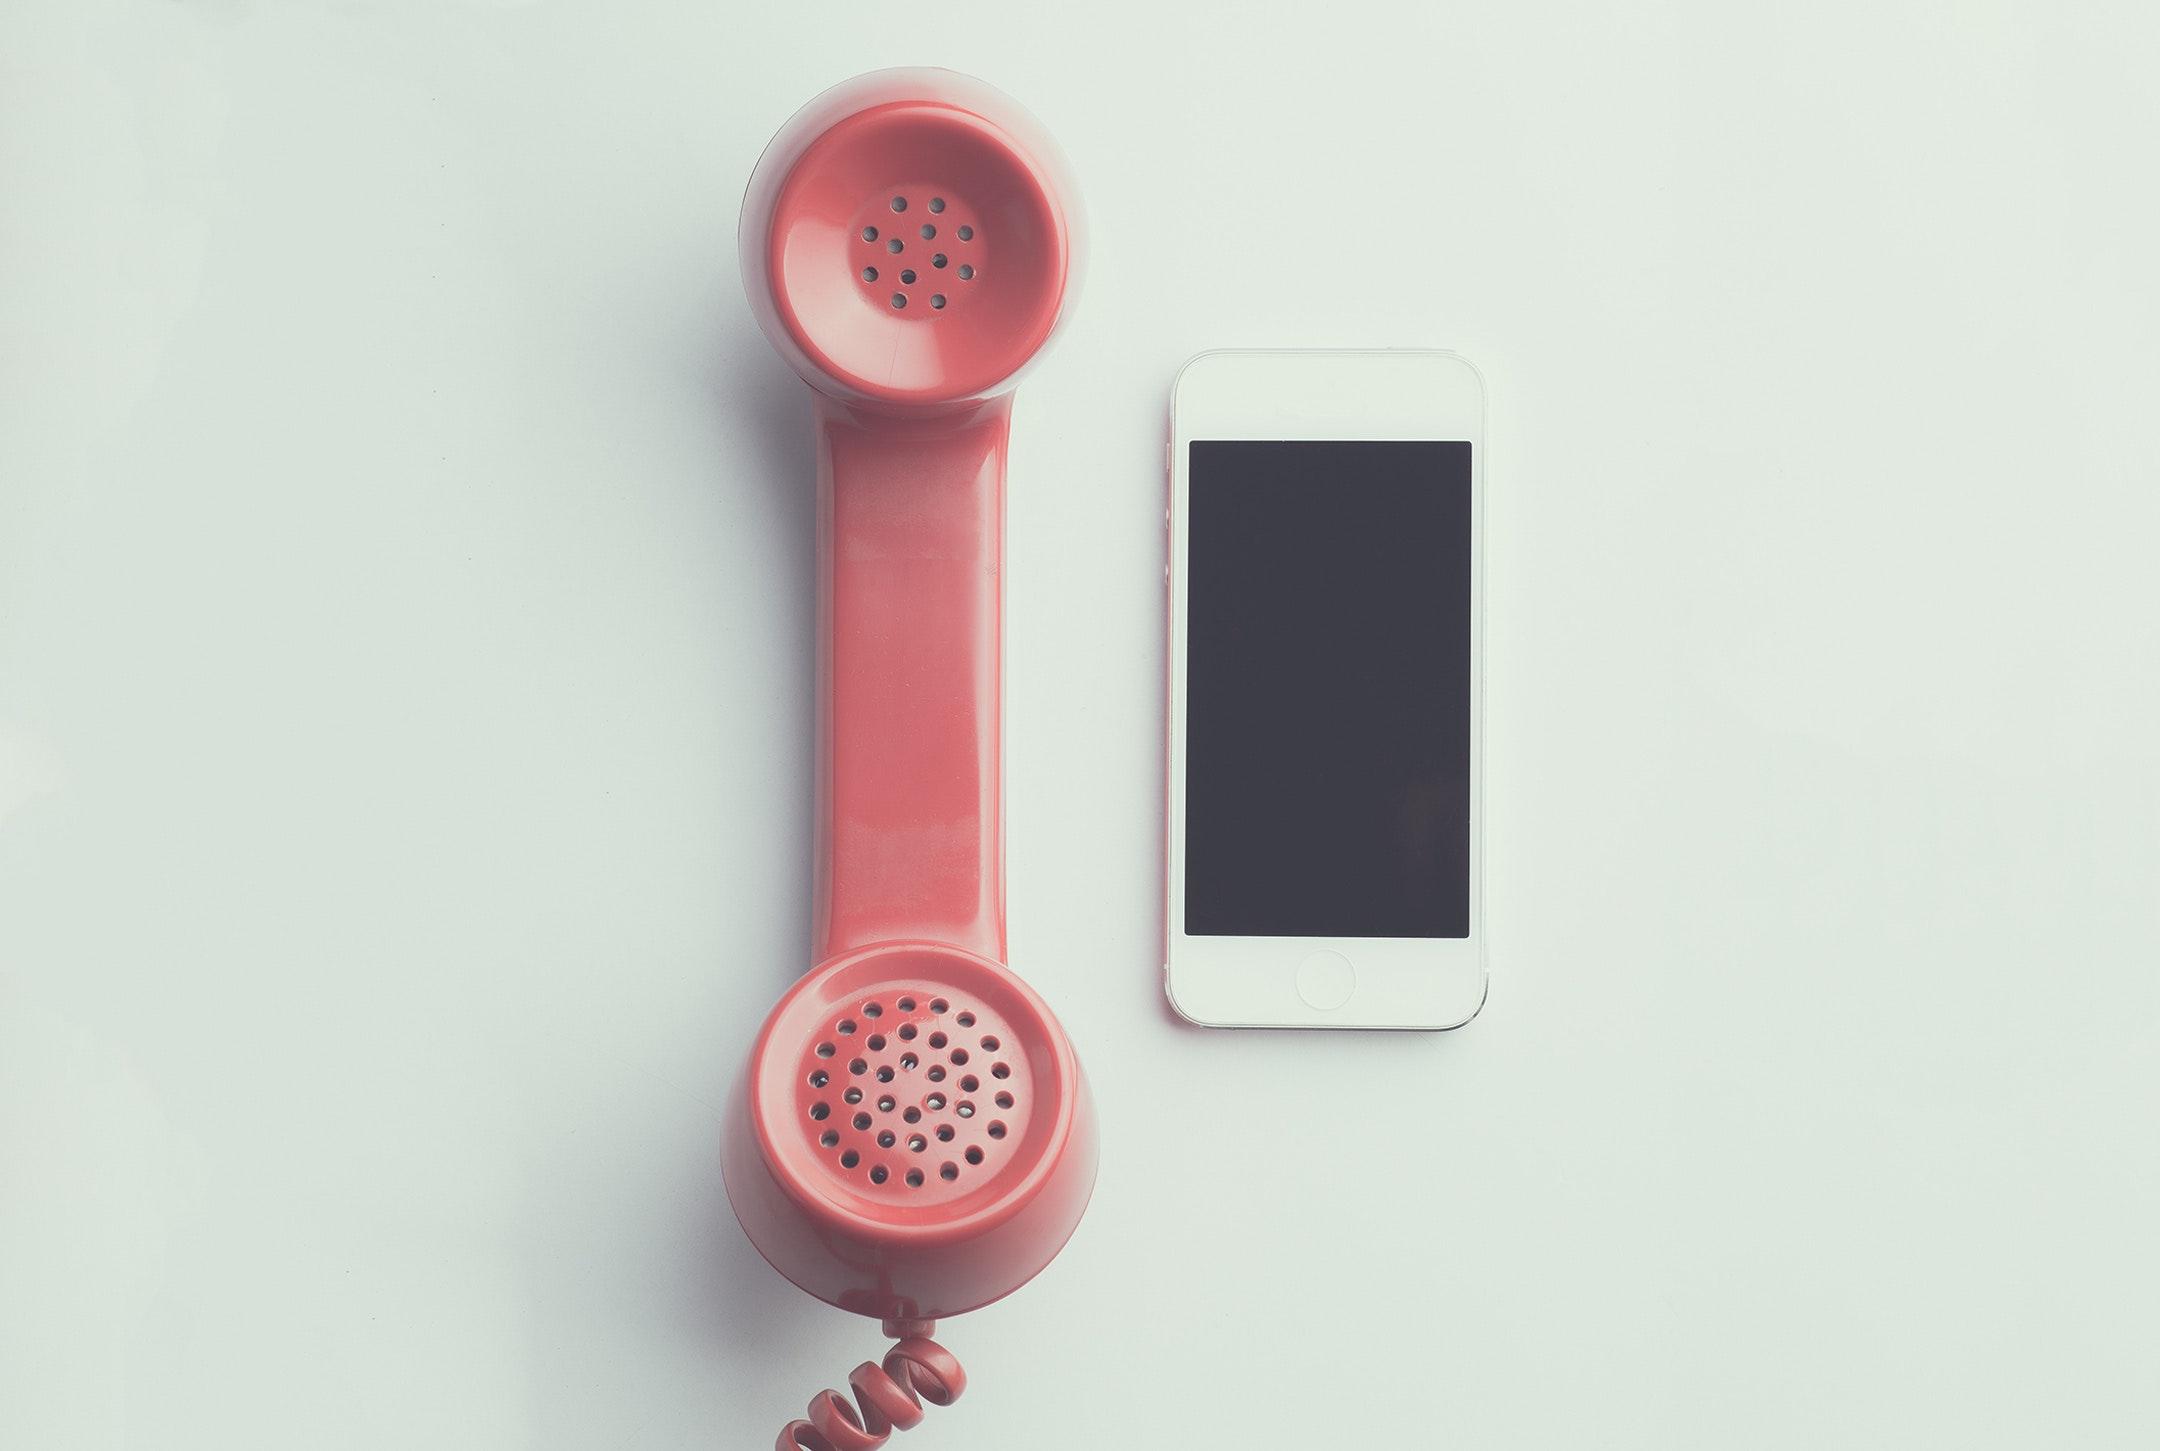 rosa Telefon neben iPhone